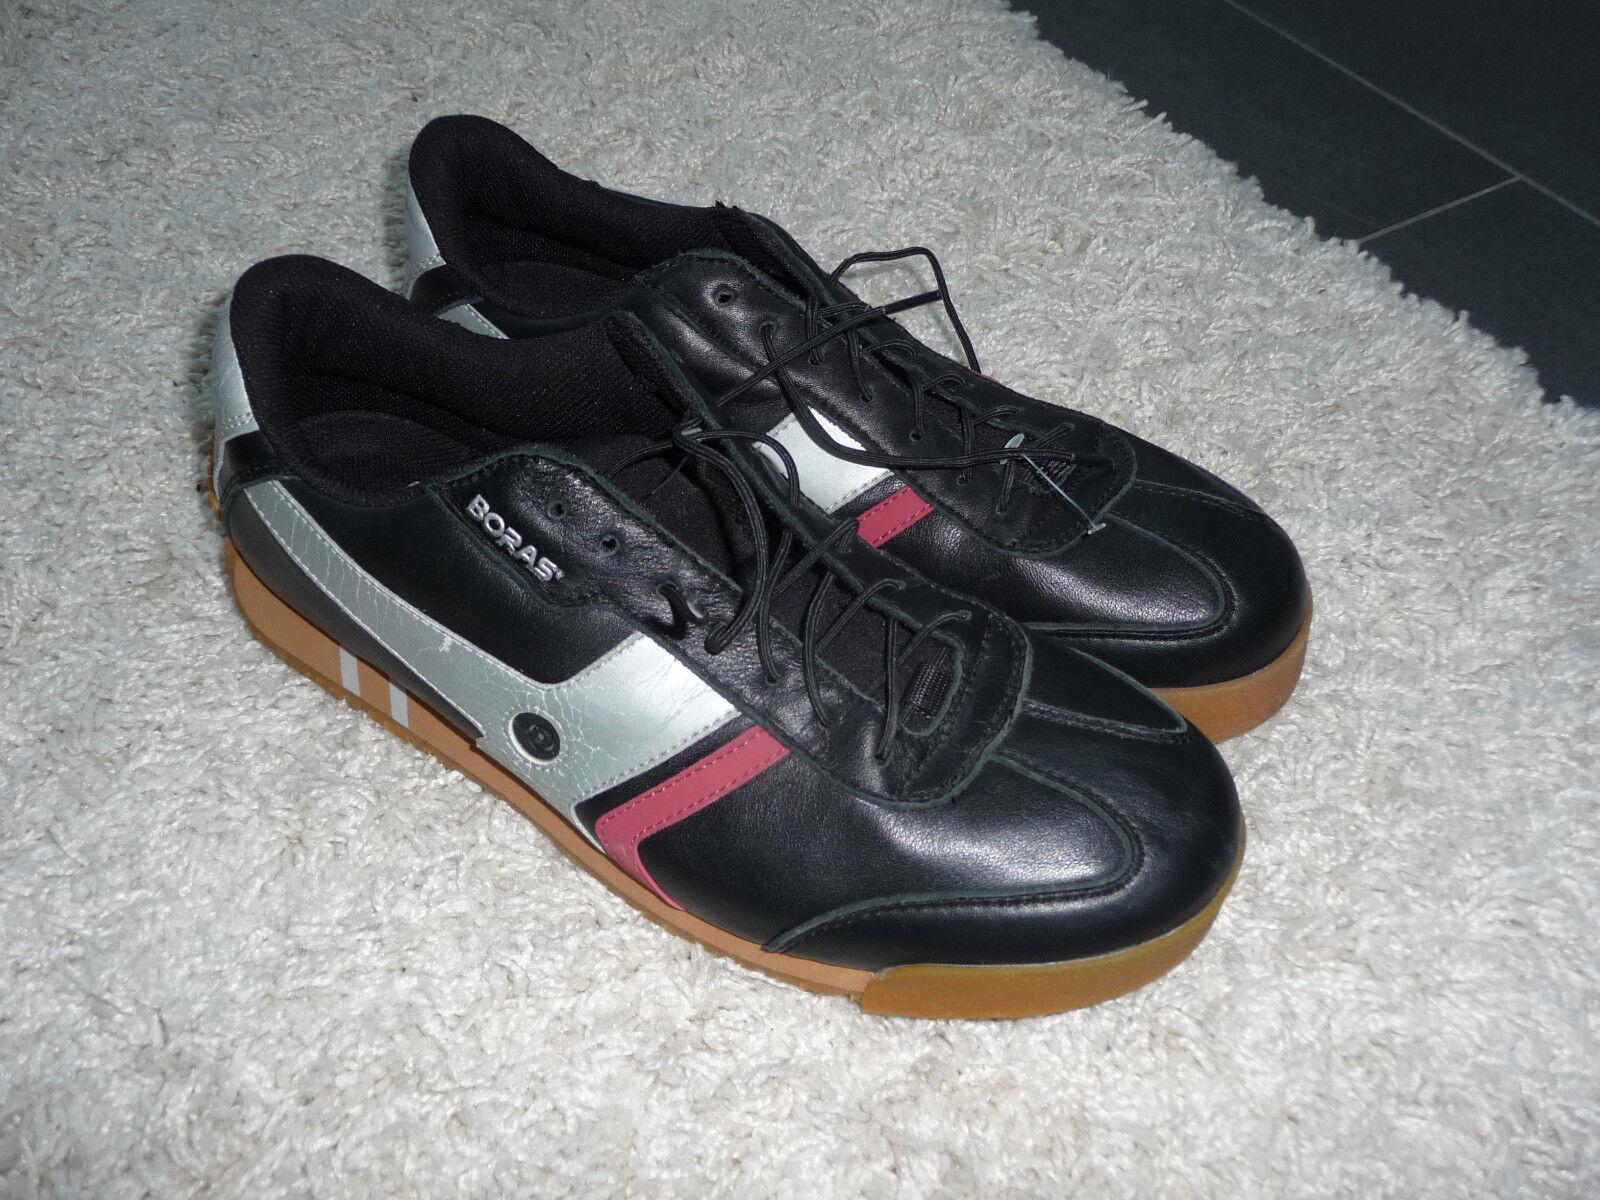 Sportlich elegante Sneaker Sportschuhe Boras Gr.47 Goal Classic Deluxe NEU Leder